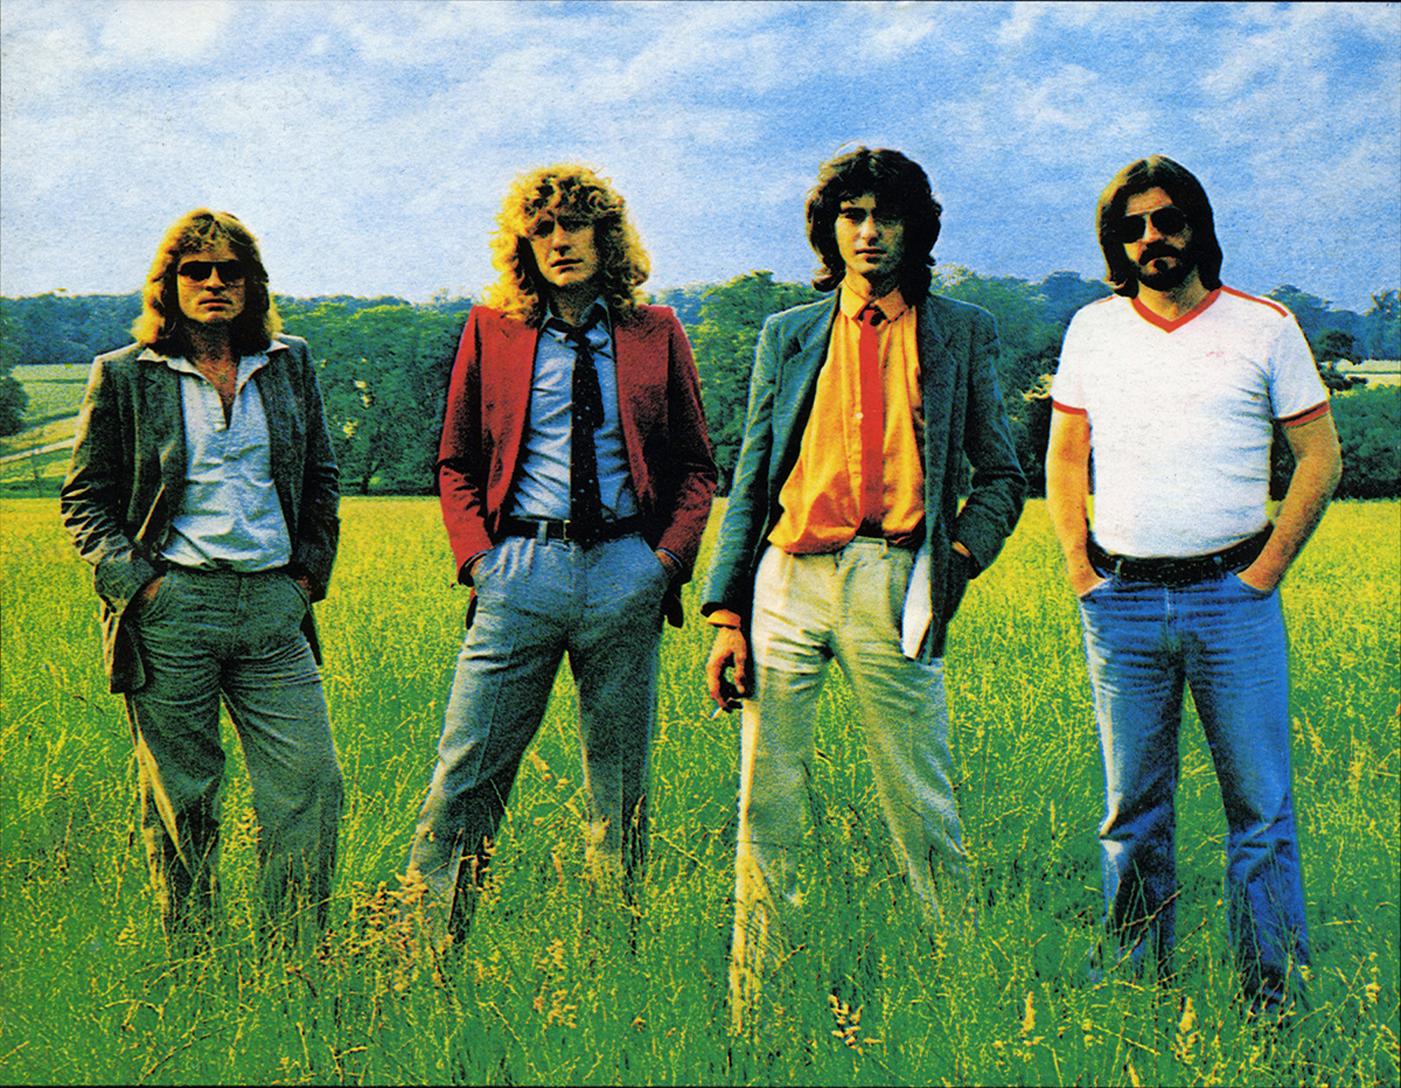 Hear Led Zeppelin's Rare, Riotous Blues Rave-Up 'Sugar Mama'